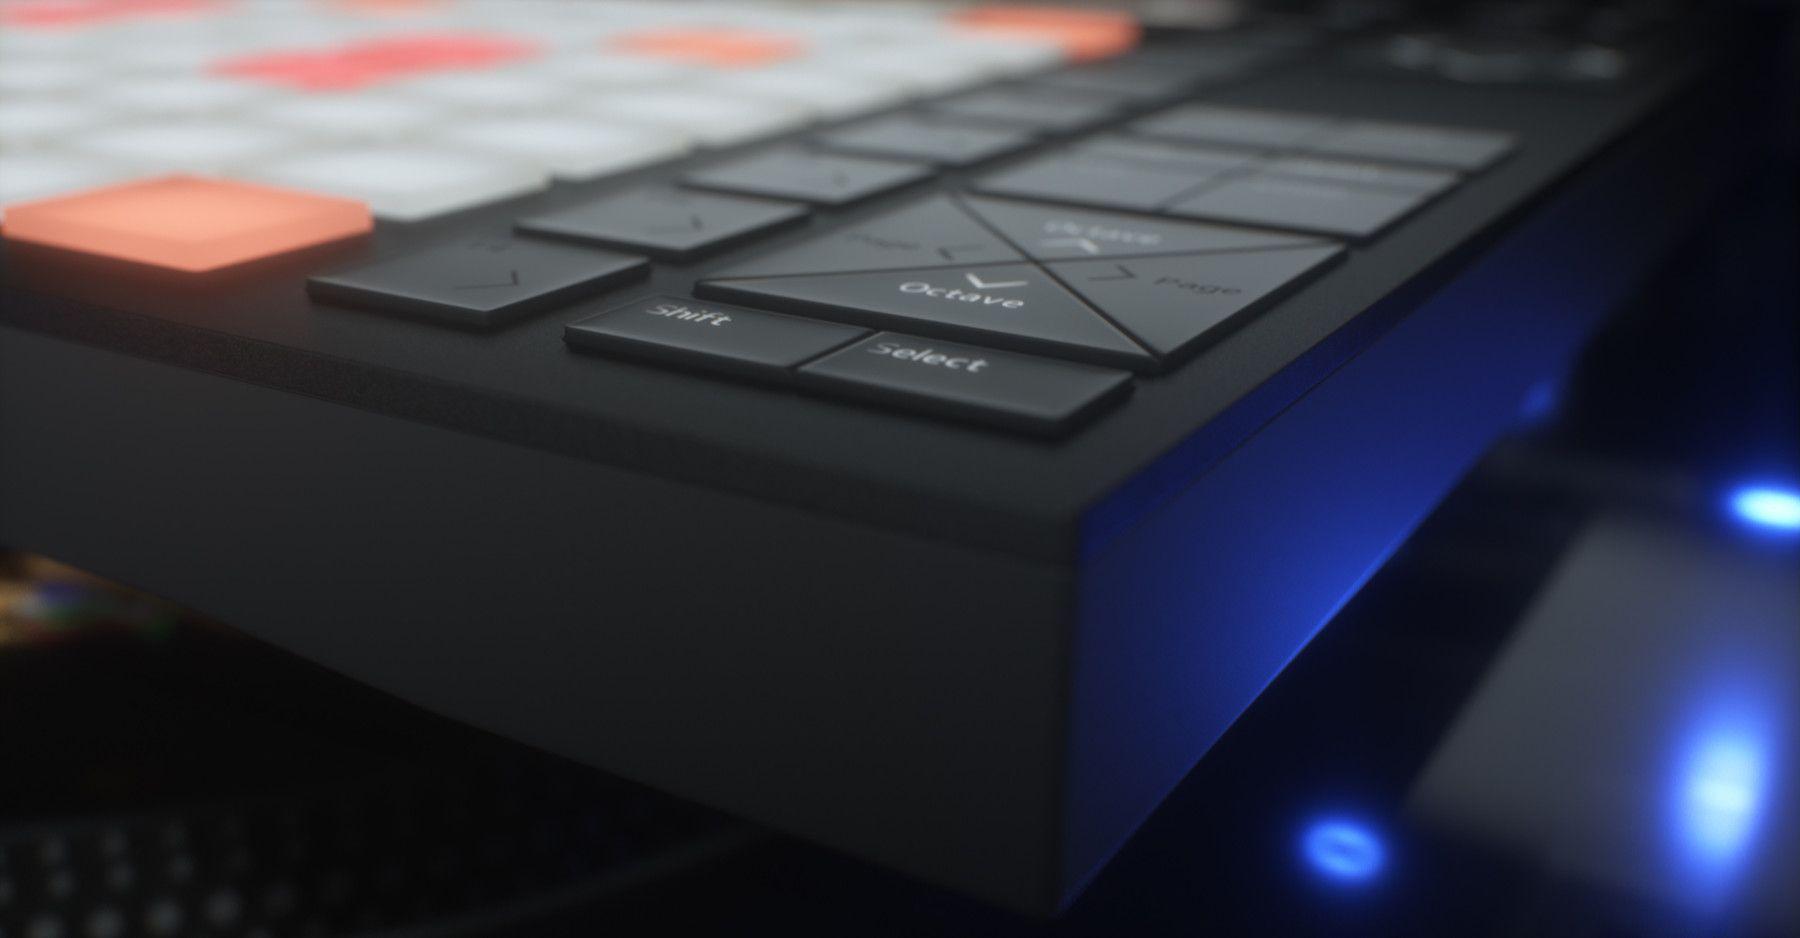 Ableton Push 2 Midi Controller 3D Model. Hard surface high